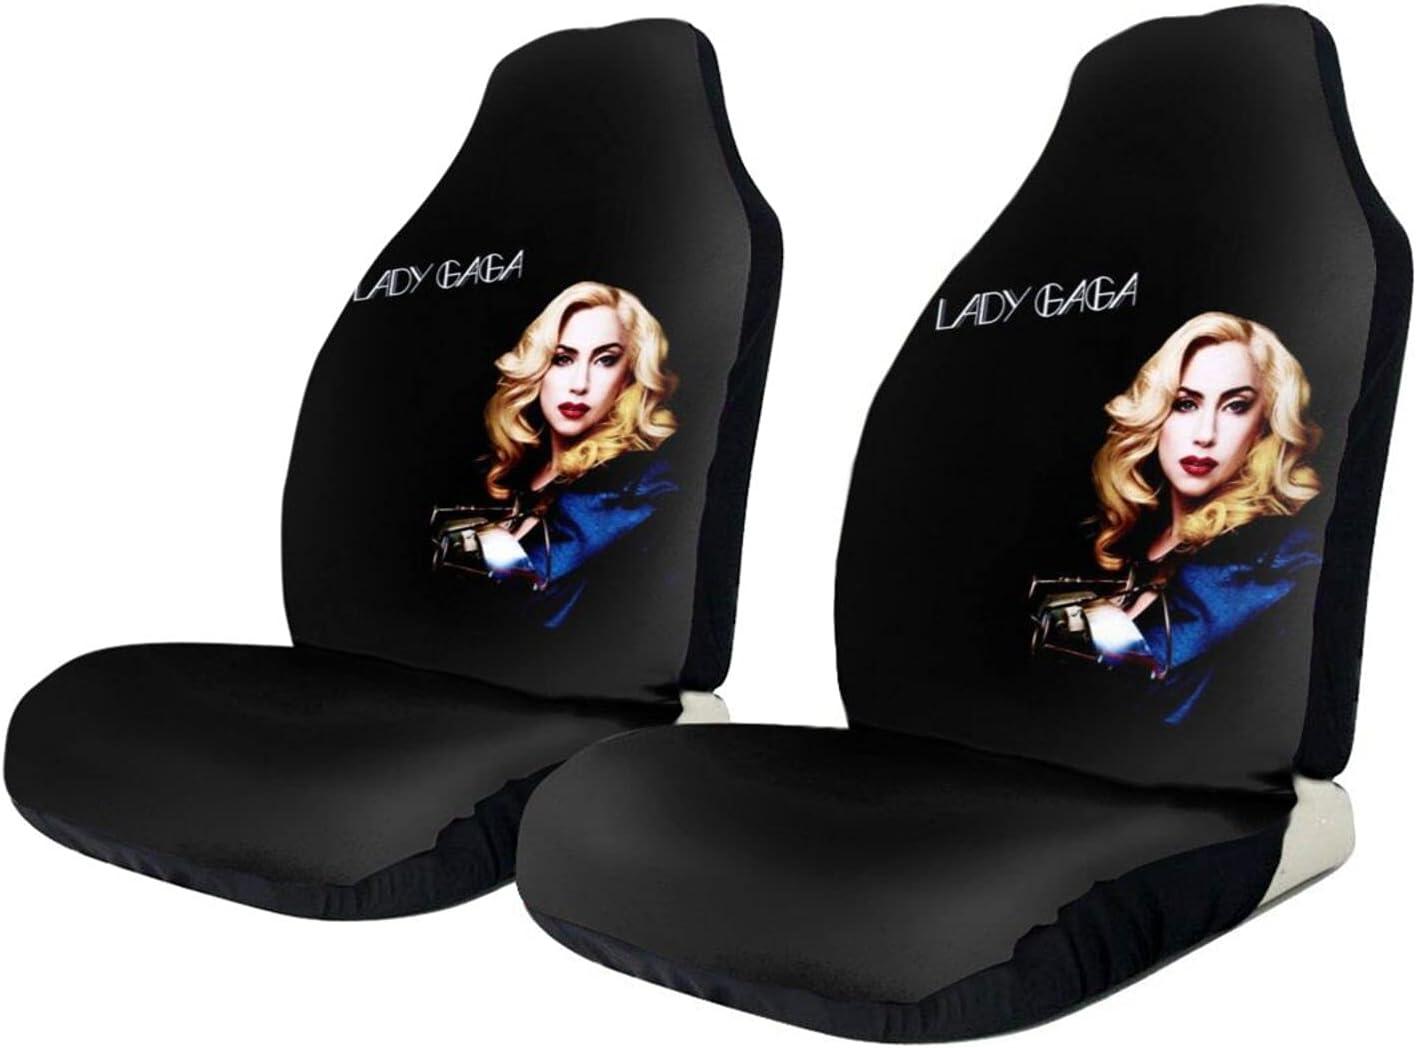 Max 82% OFF Ladyga-ga Car Seat Classic Covers Interior Mat Accessories Cushion Pad